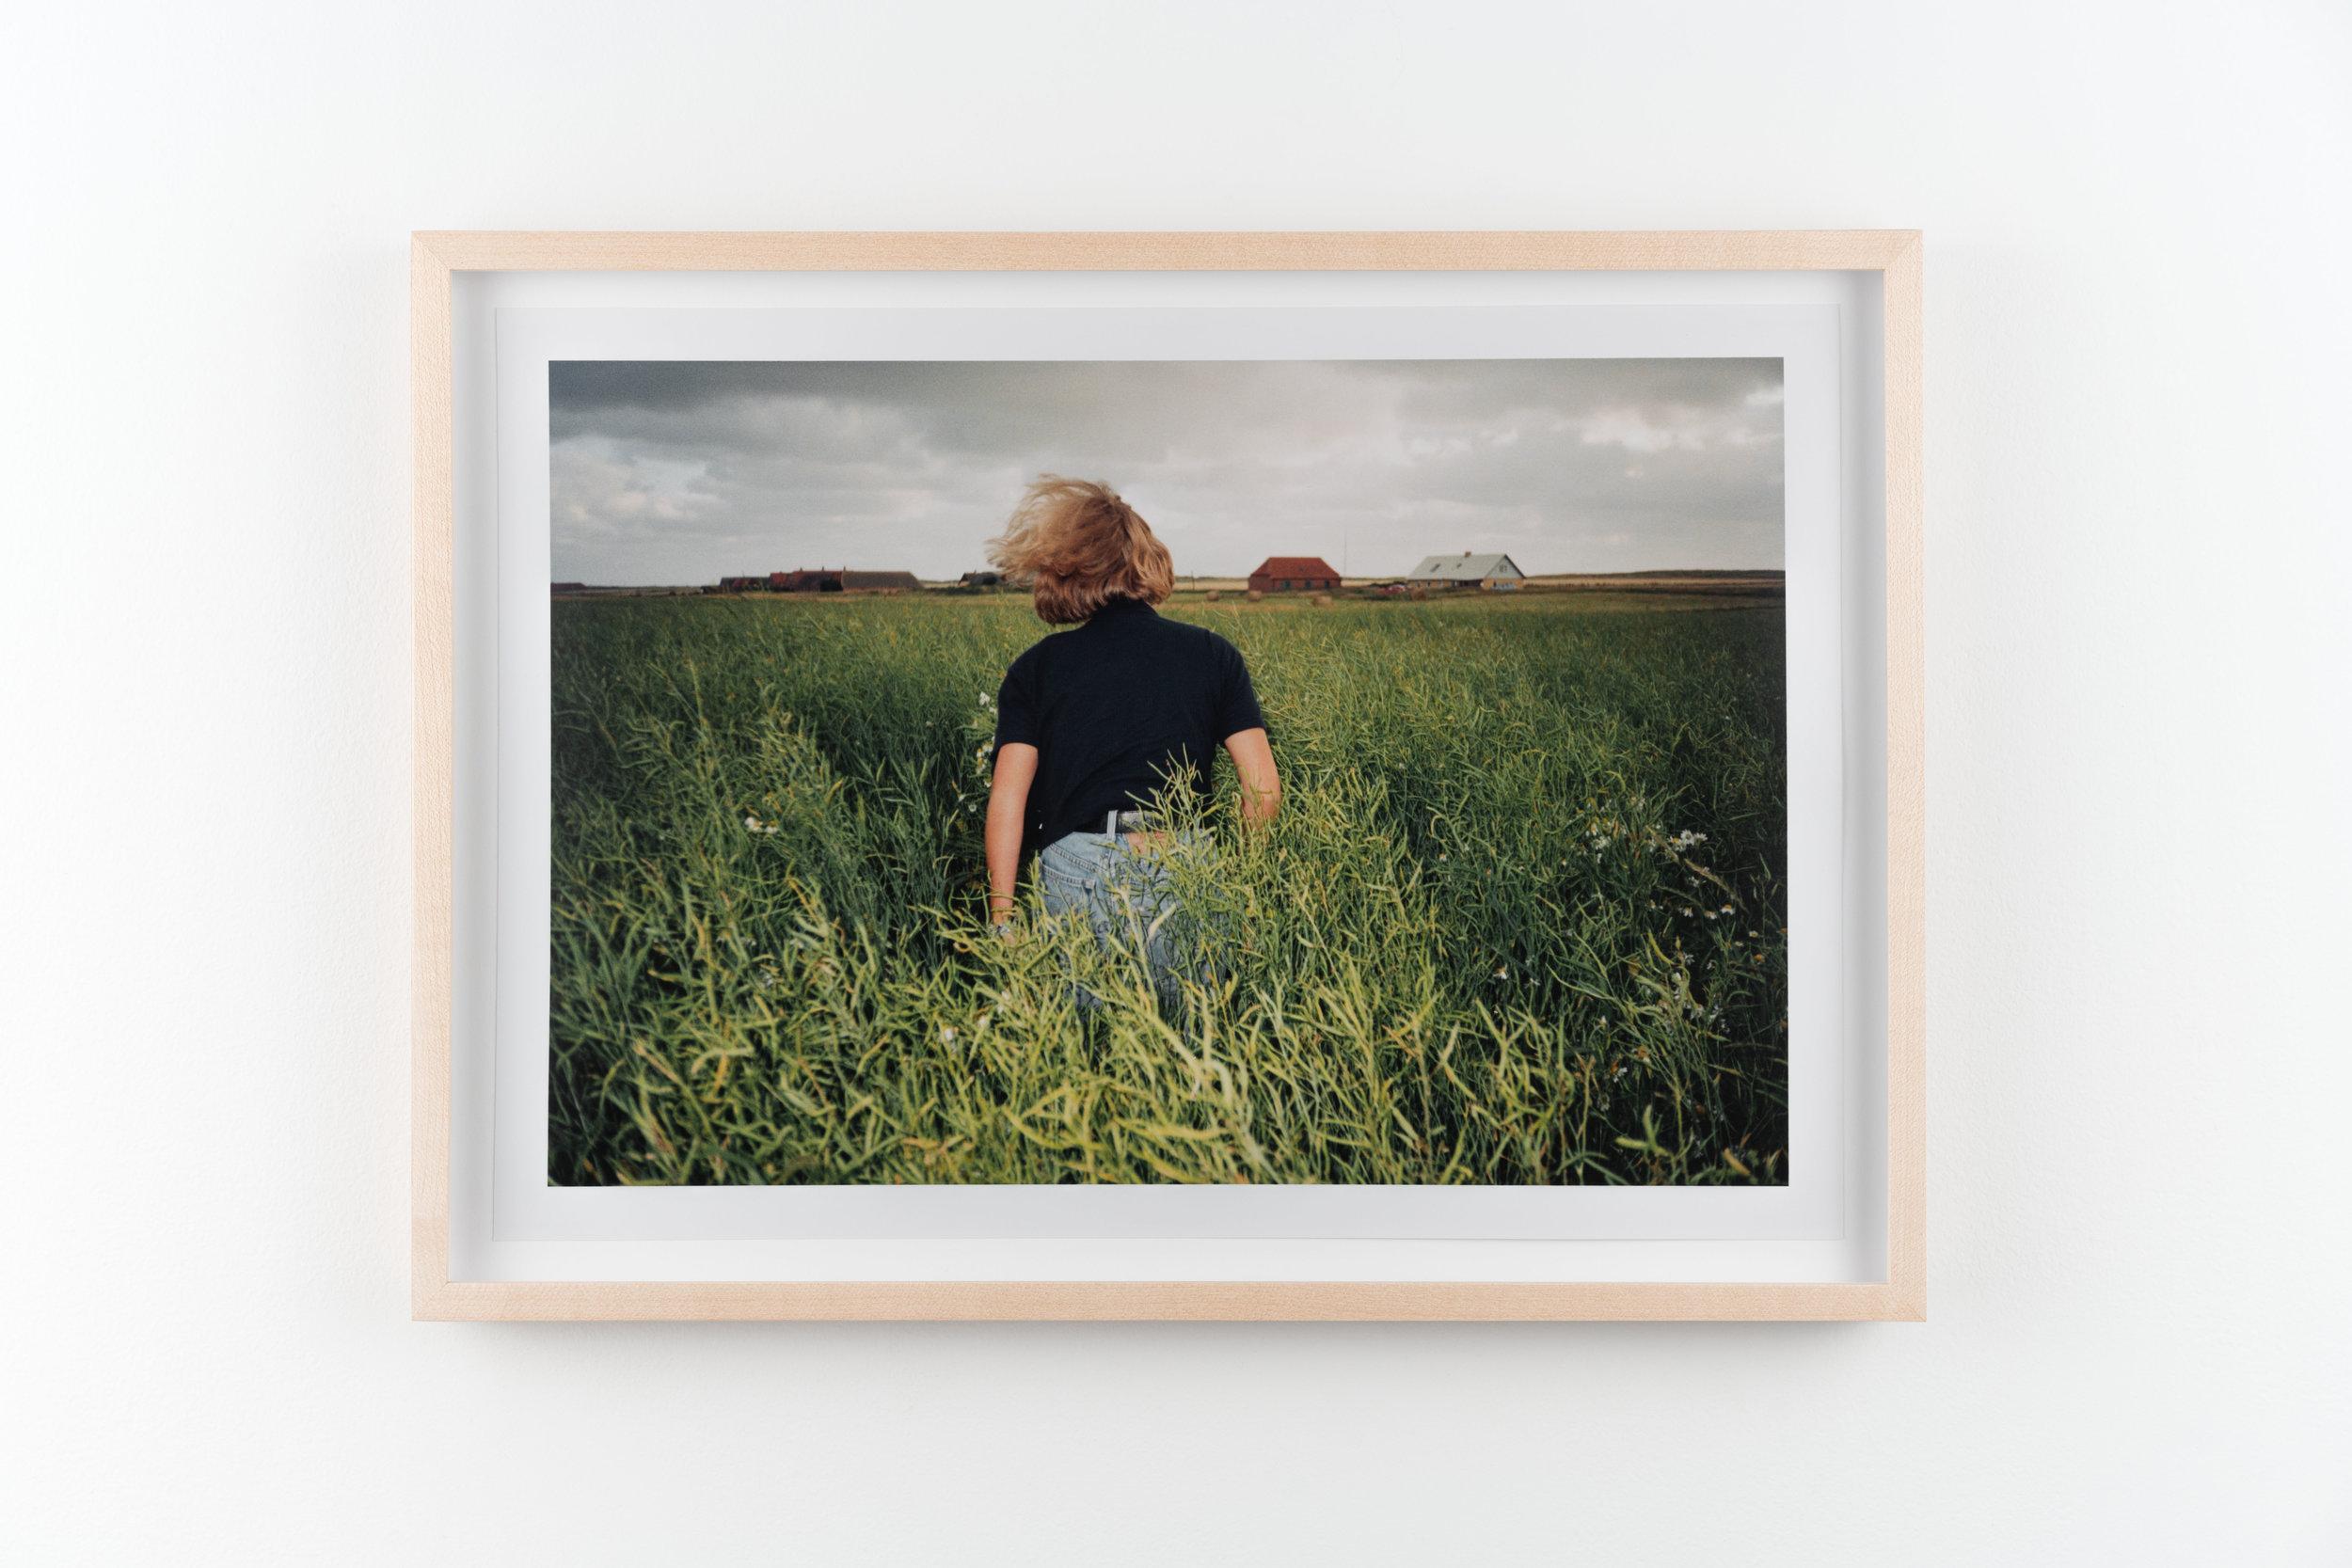 Christina 1 , 1995/2018 Hand-printed c-print 21.8 x 32.8 cm (28.5 x 39.5 cm framed)